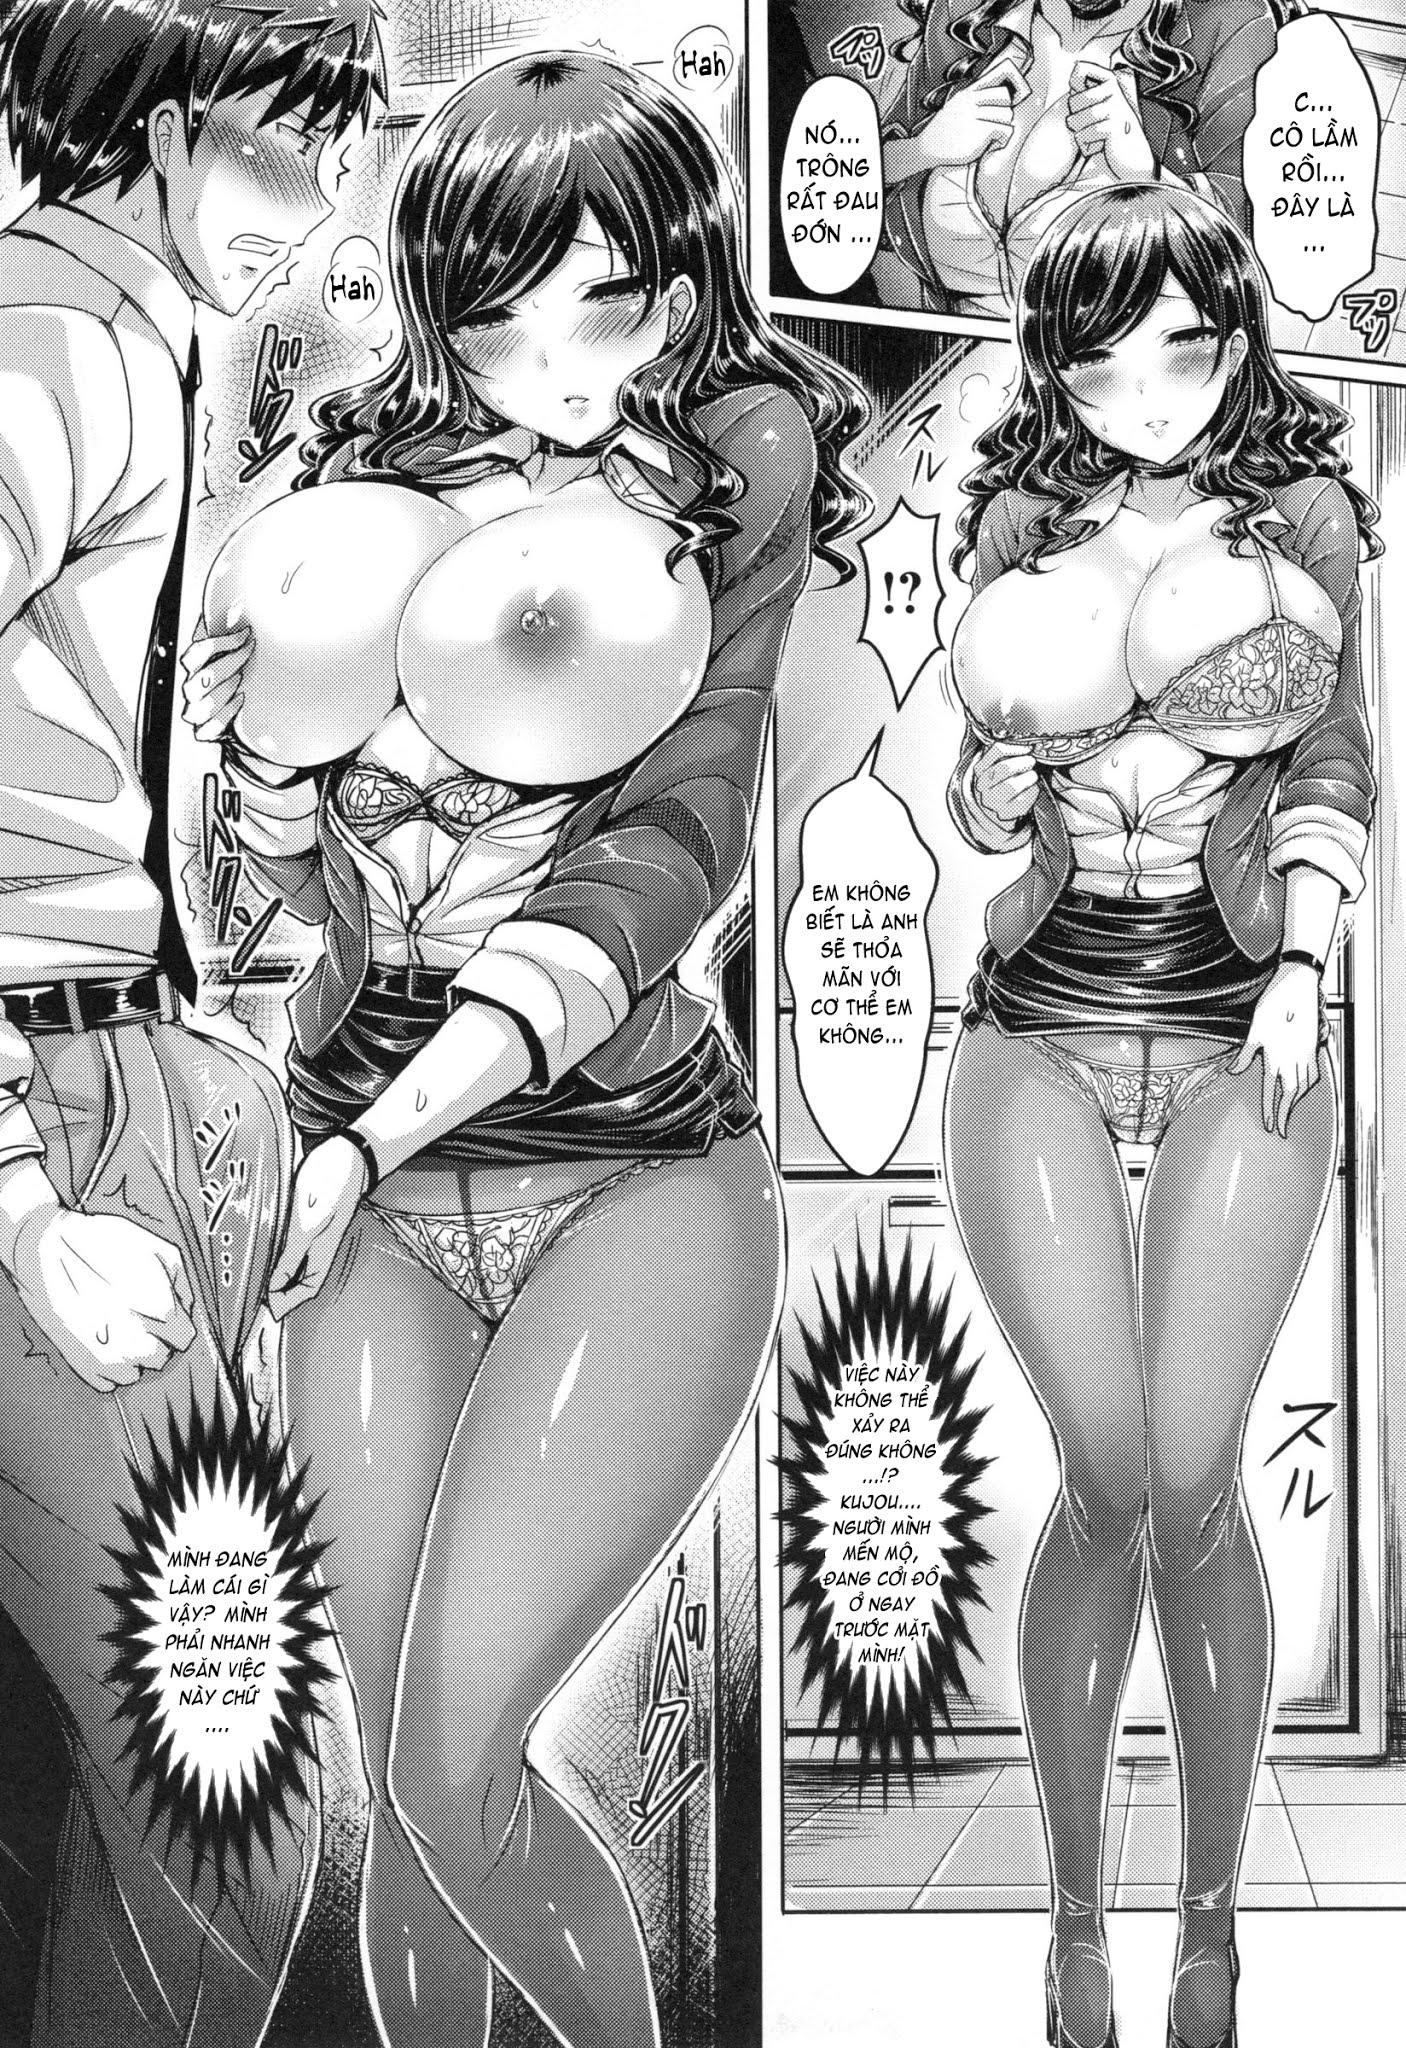 win-hentairules.net-199 Koizome Marking  - hentaicube.net - Truyện tranh hentai online